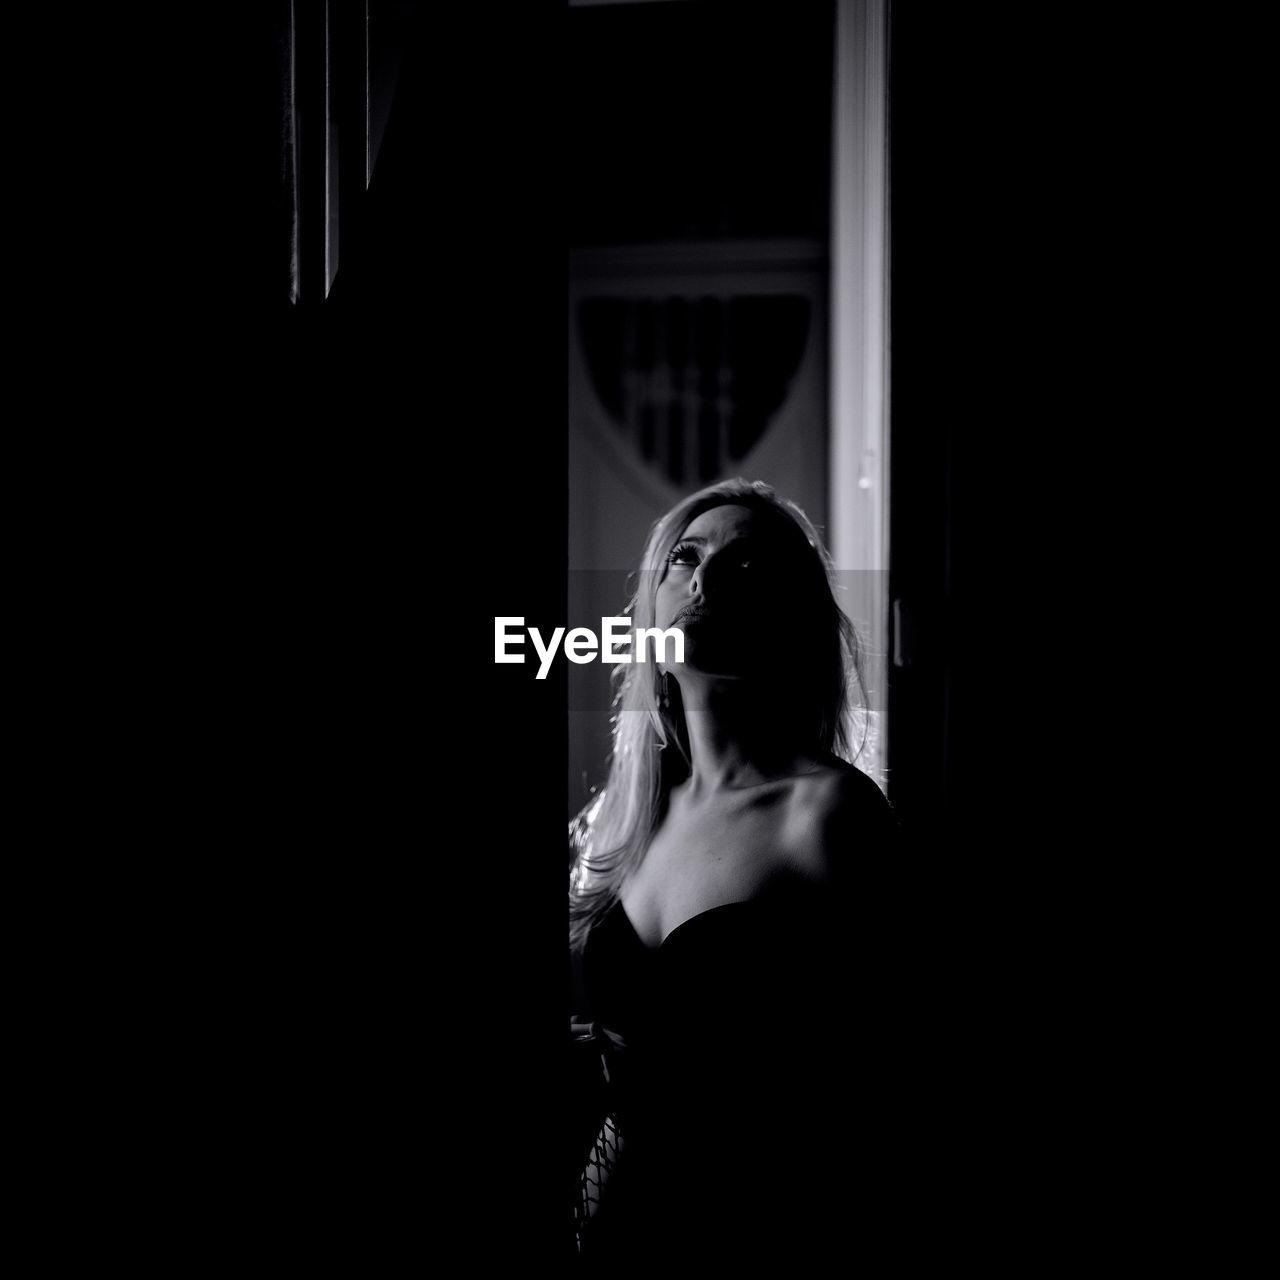 Mid Adult Woman Looking Up While Standing At Doorway In Darkroom